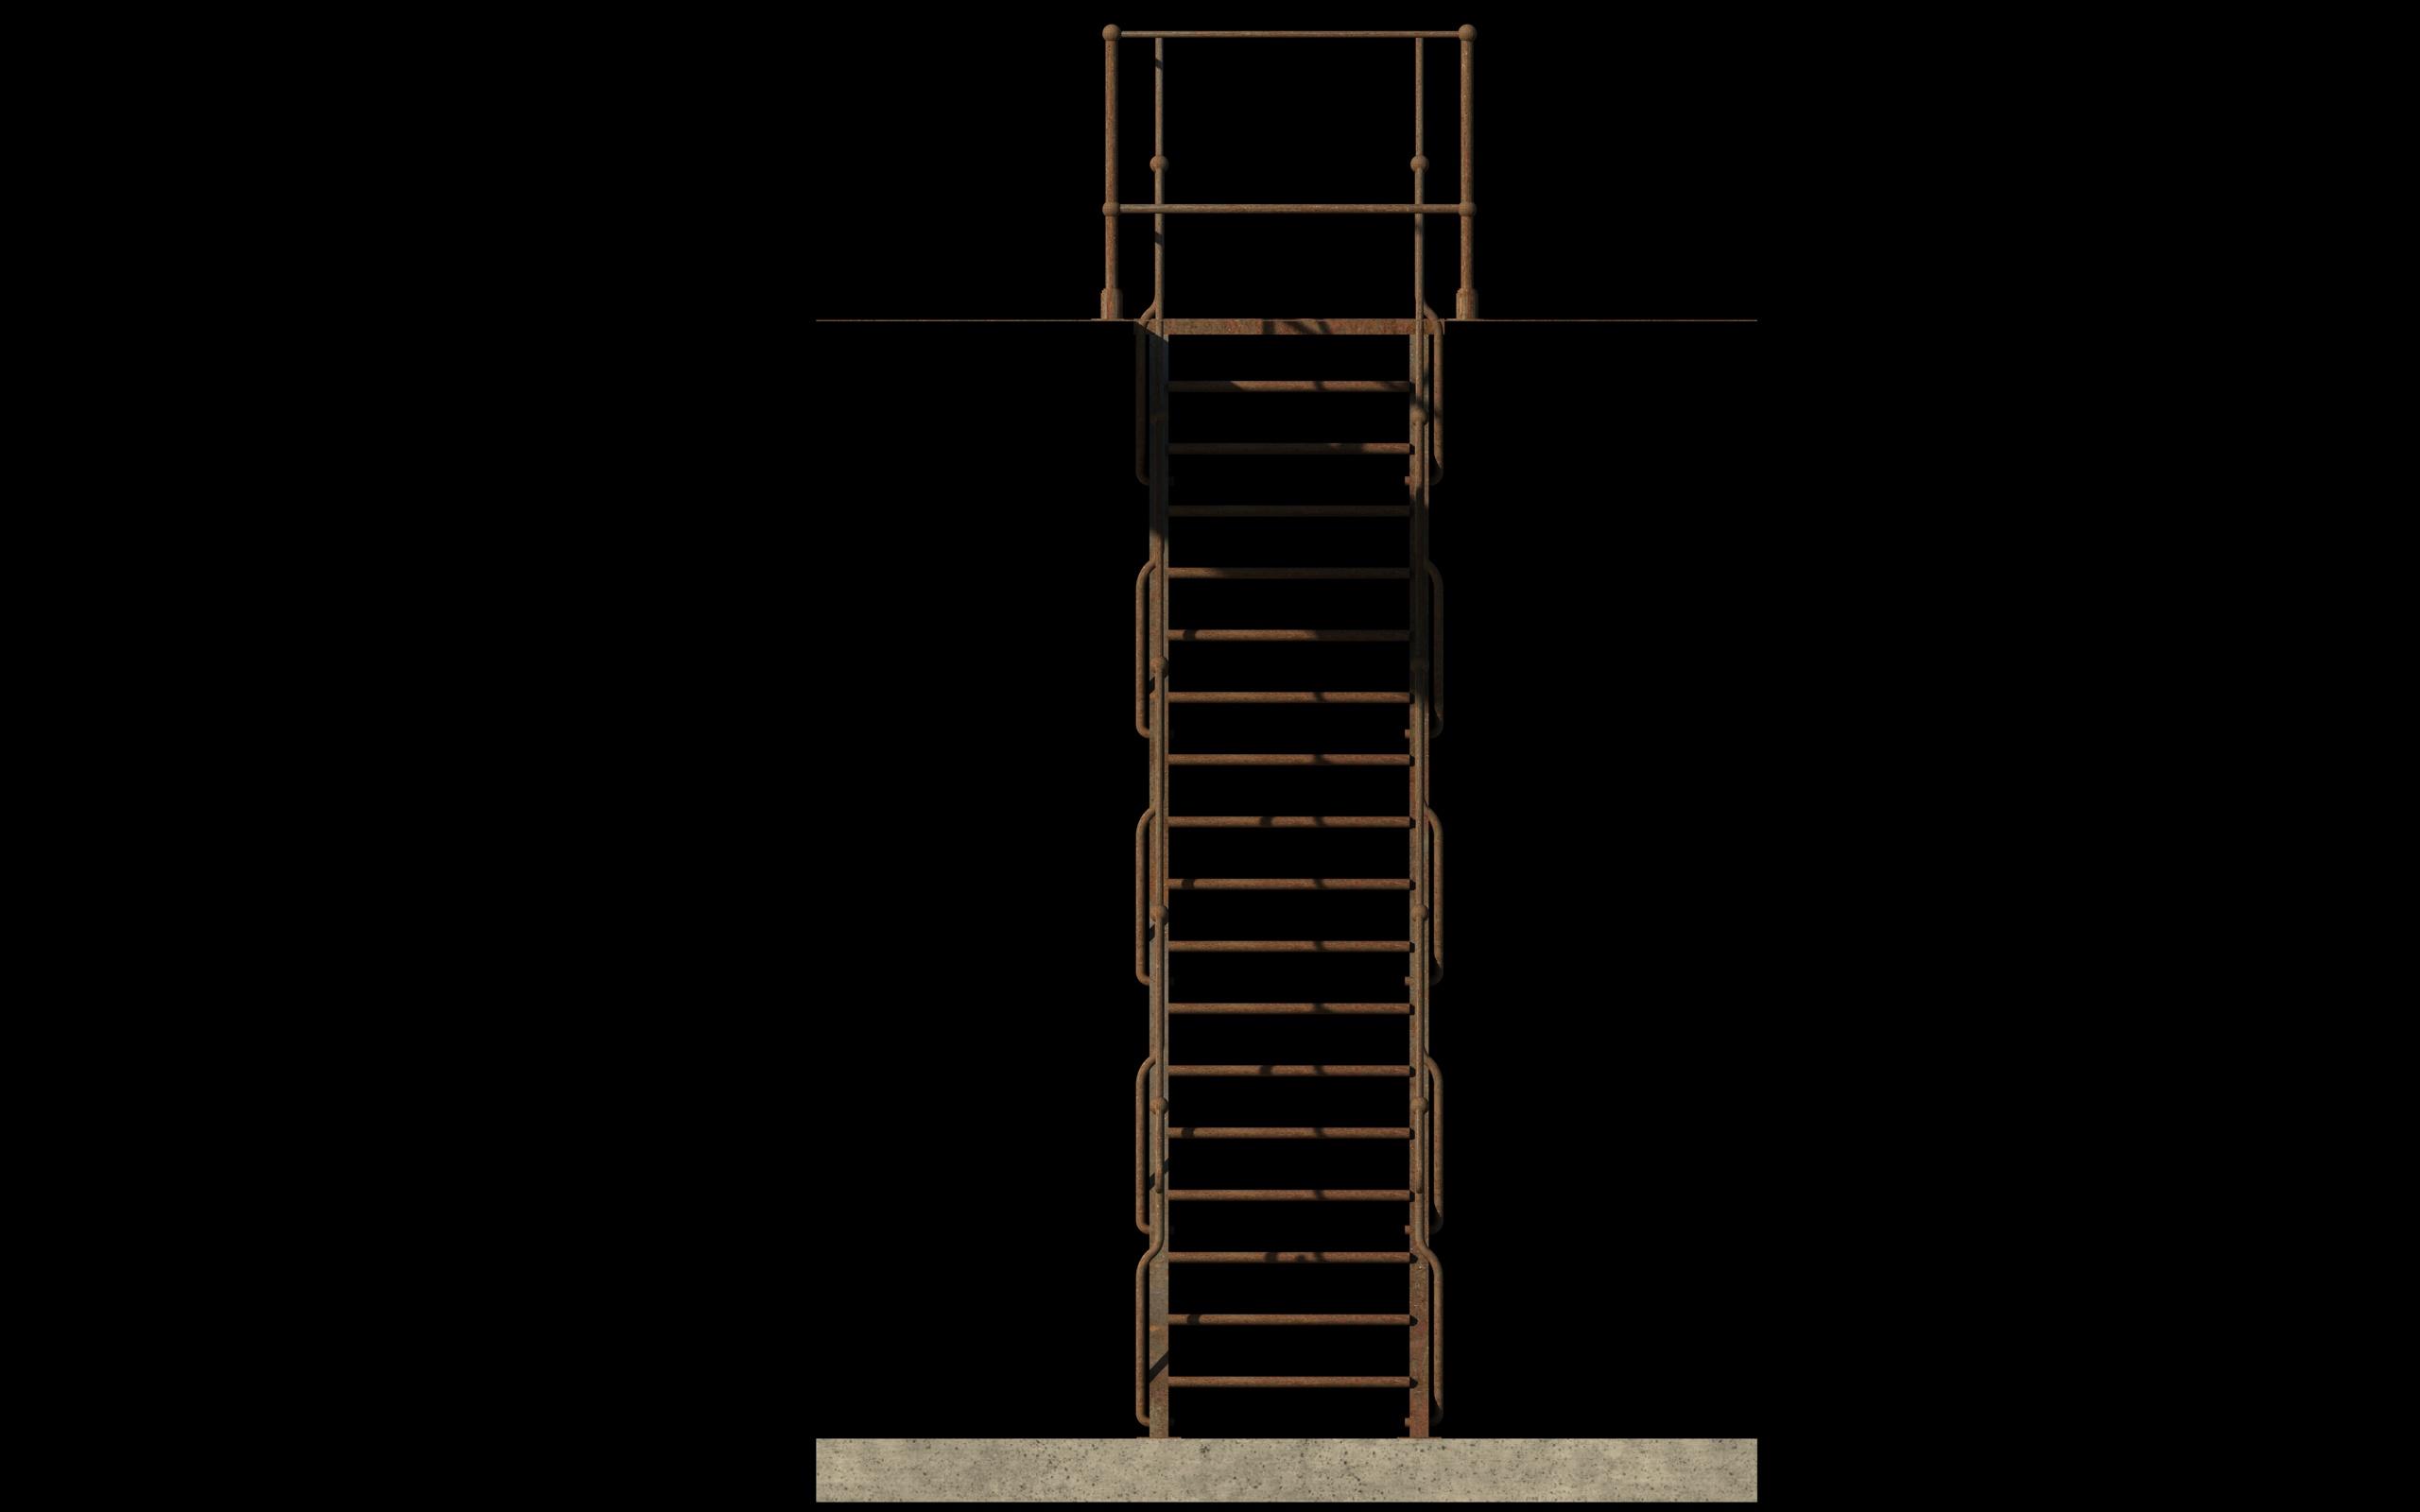 iron stair 3d obj 3d model 3ds dxf c4d skp obj 148394